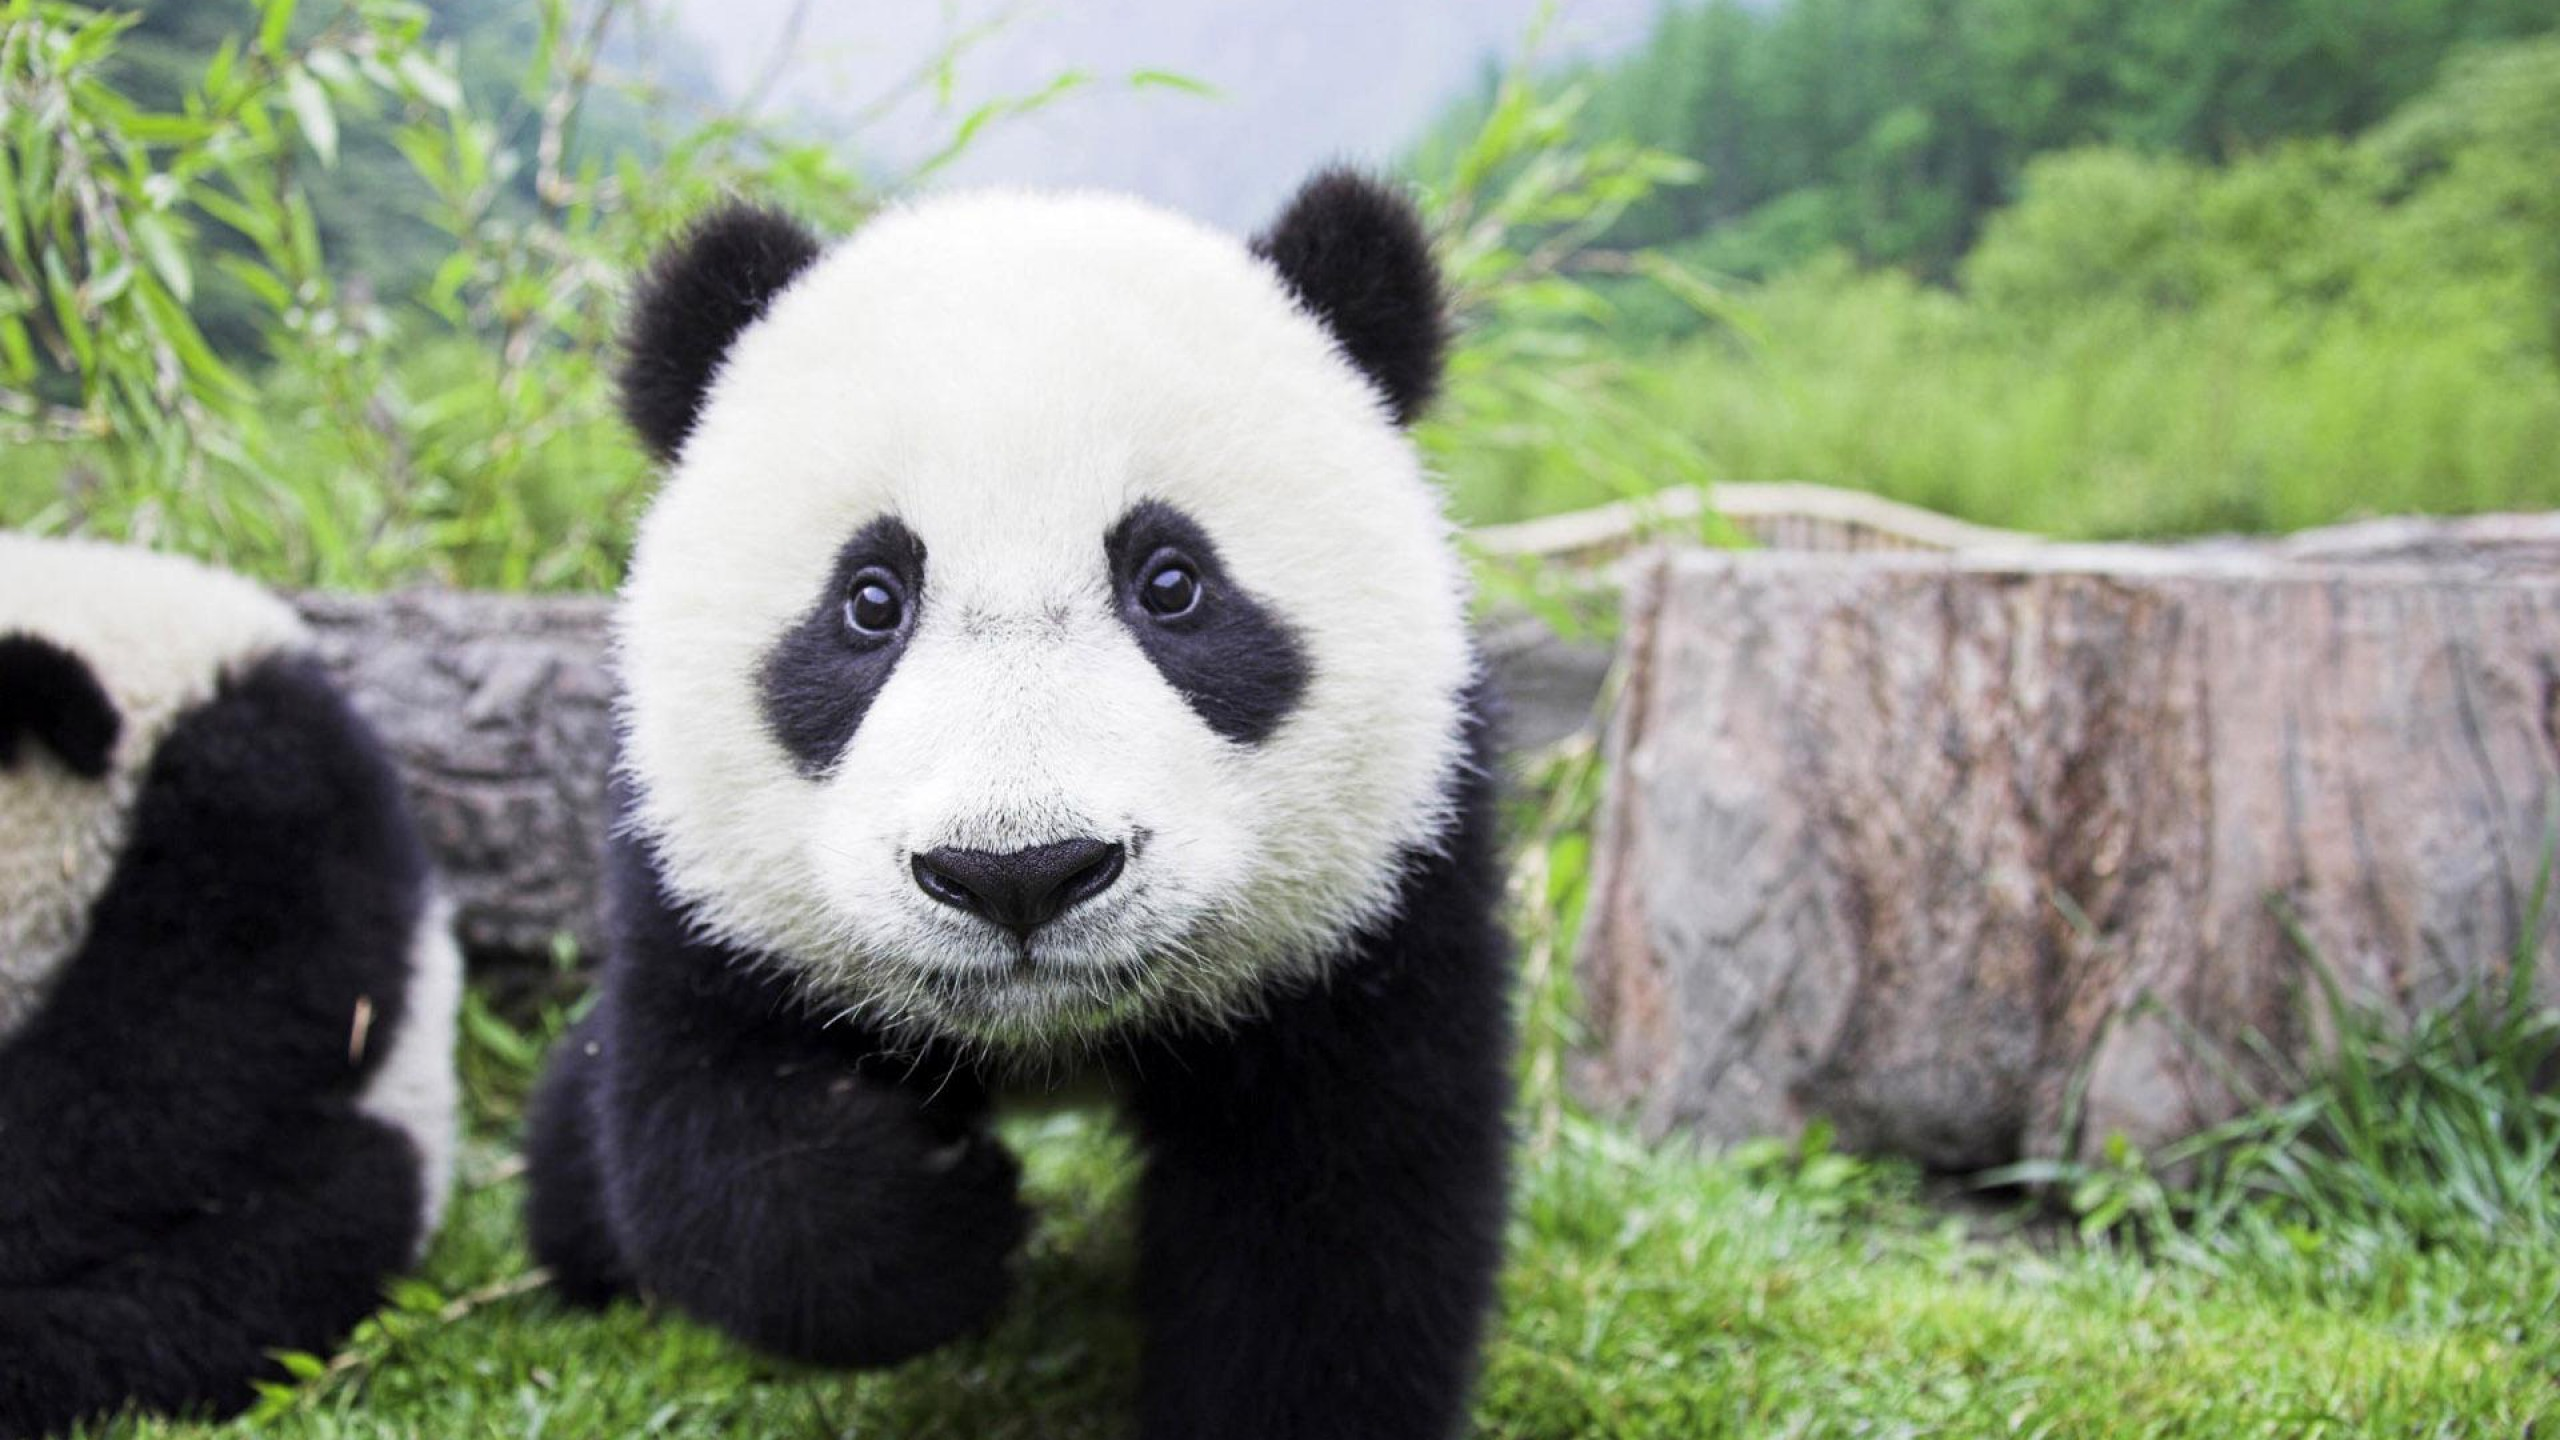 Explore Baby Pandas, Giant Pandas, and more!